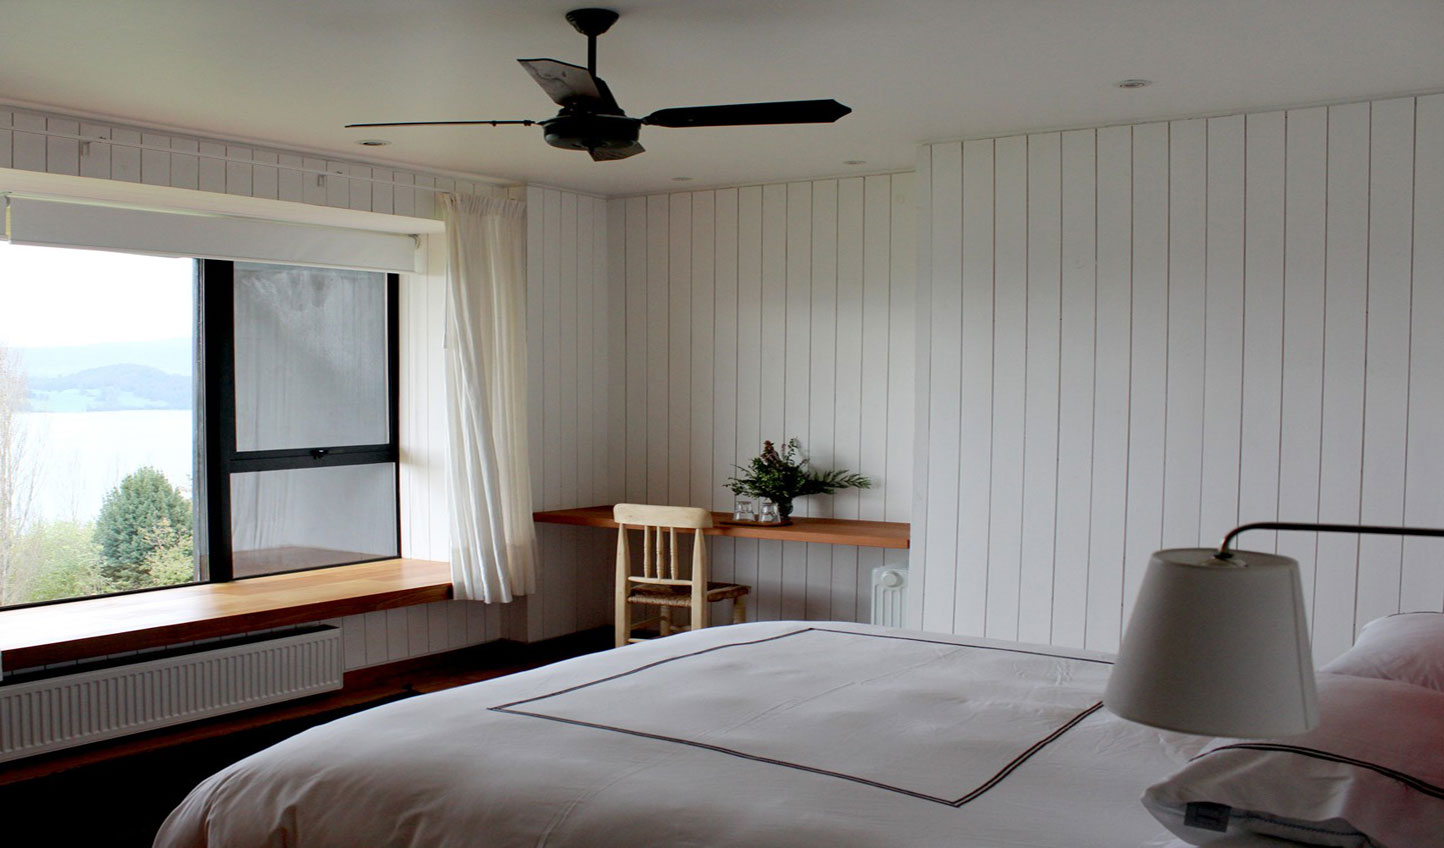 Scenic bedroom